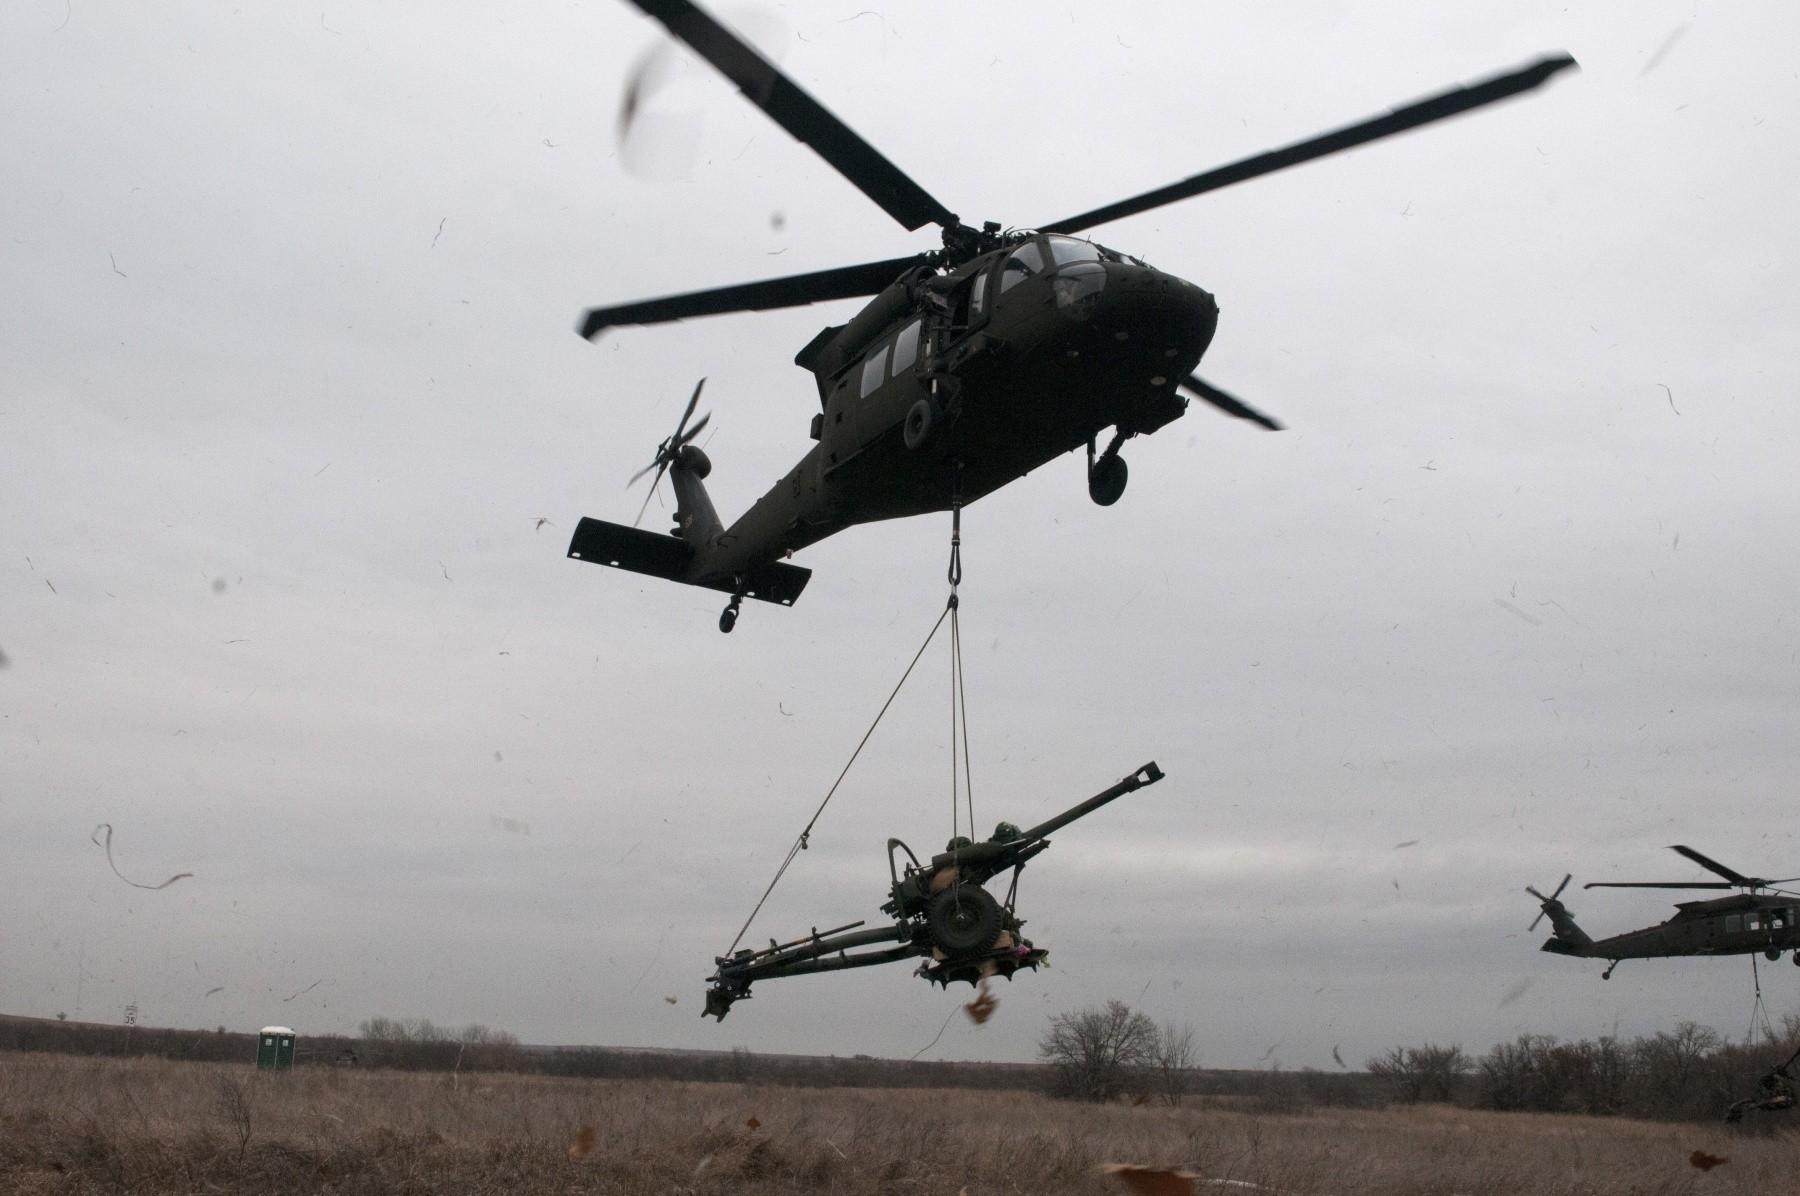 Oklahoma Army National Guard Aviators and Field Artillery